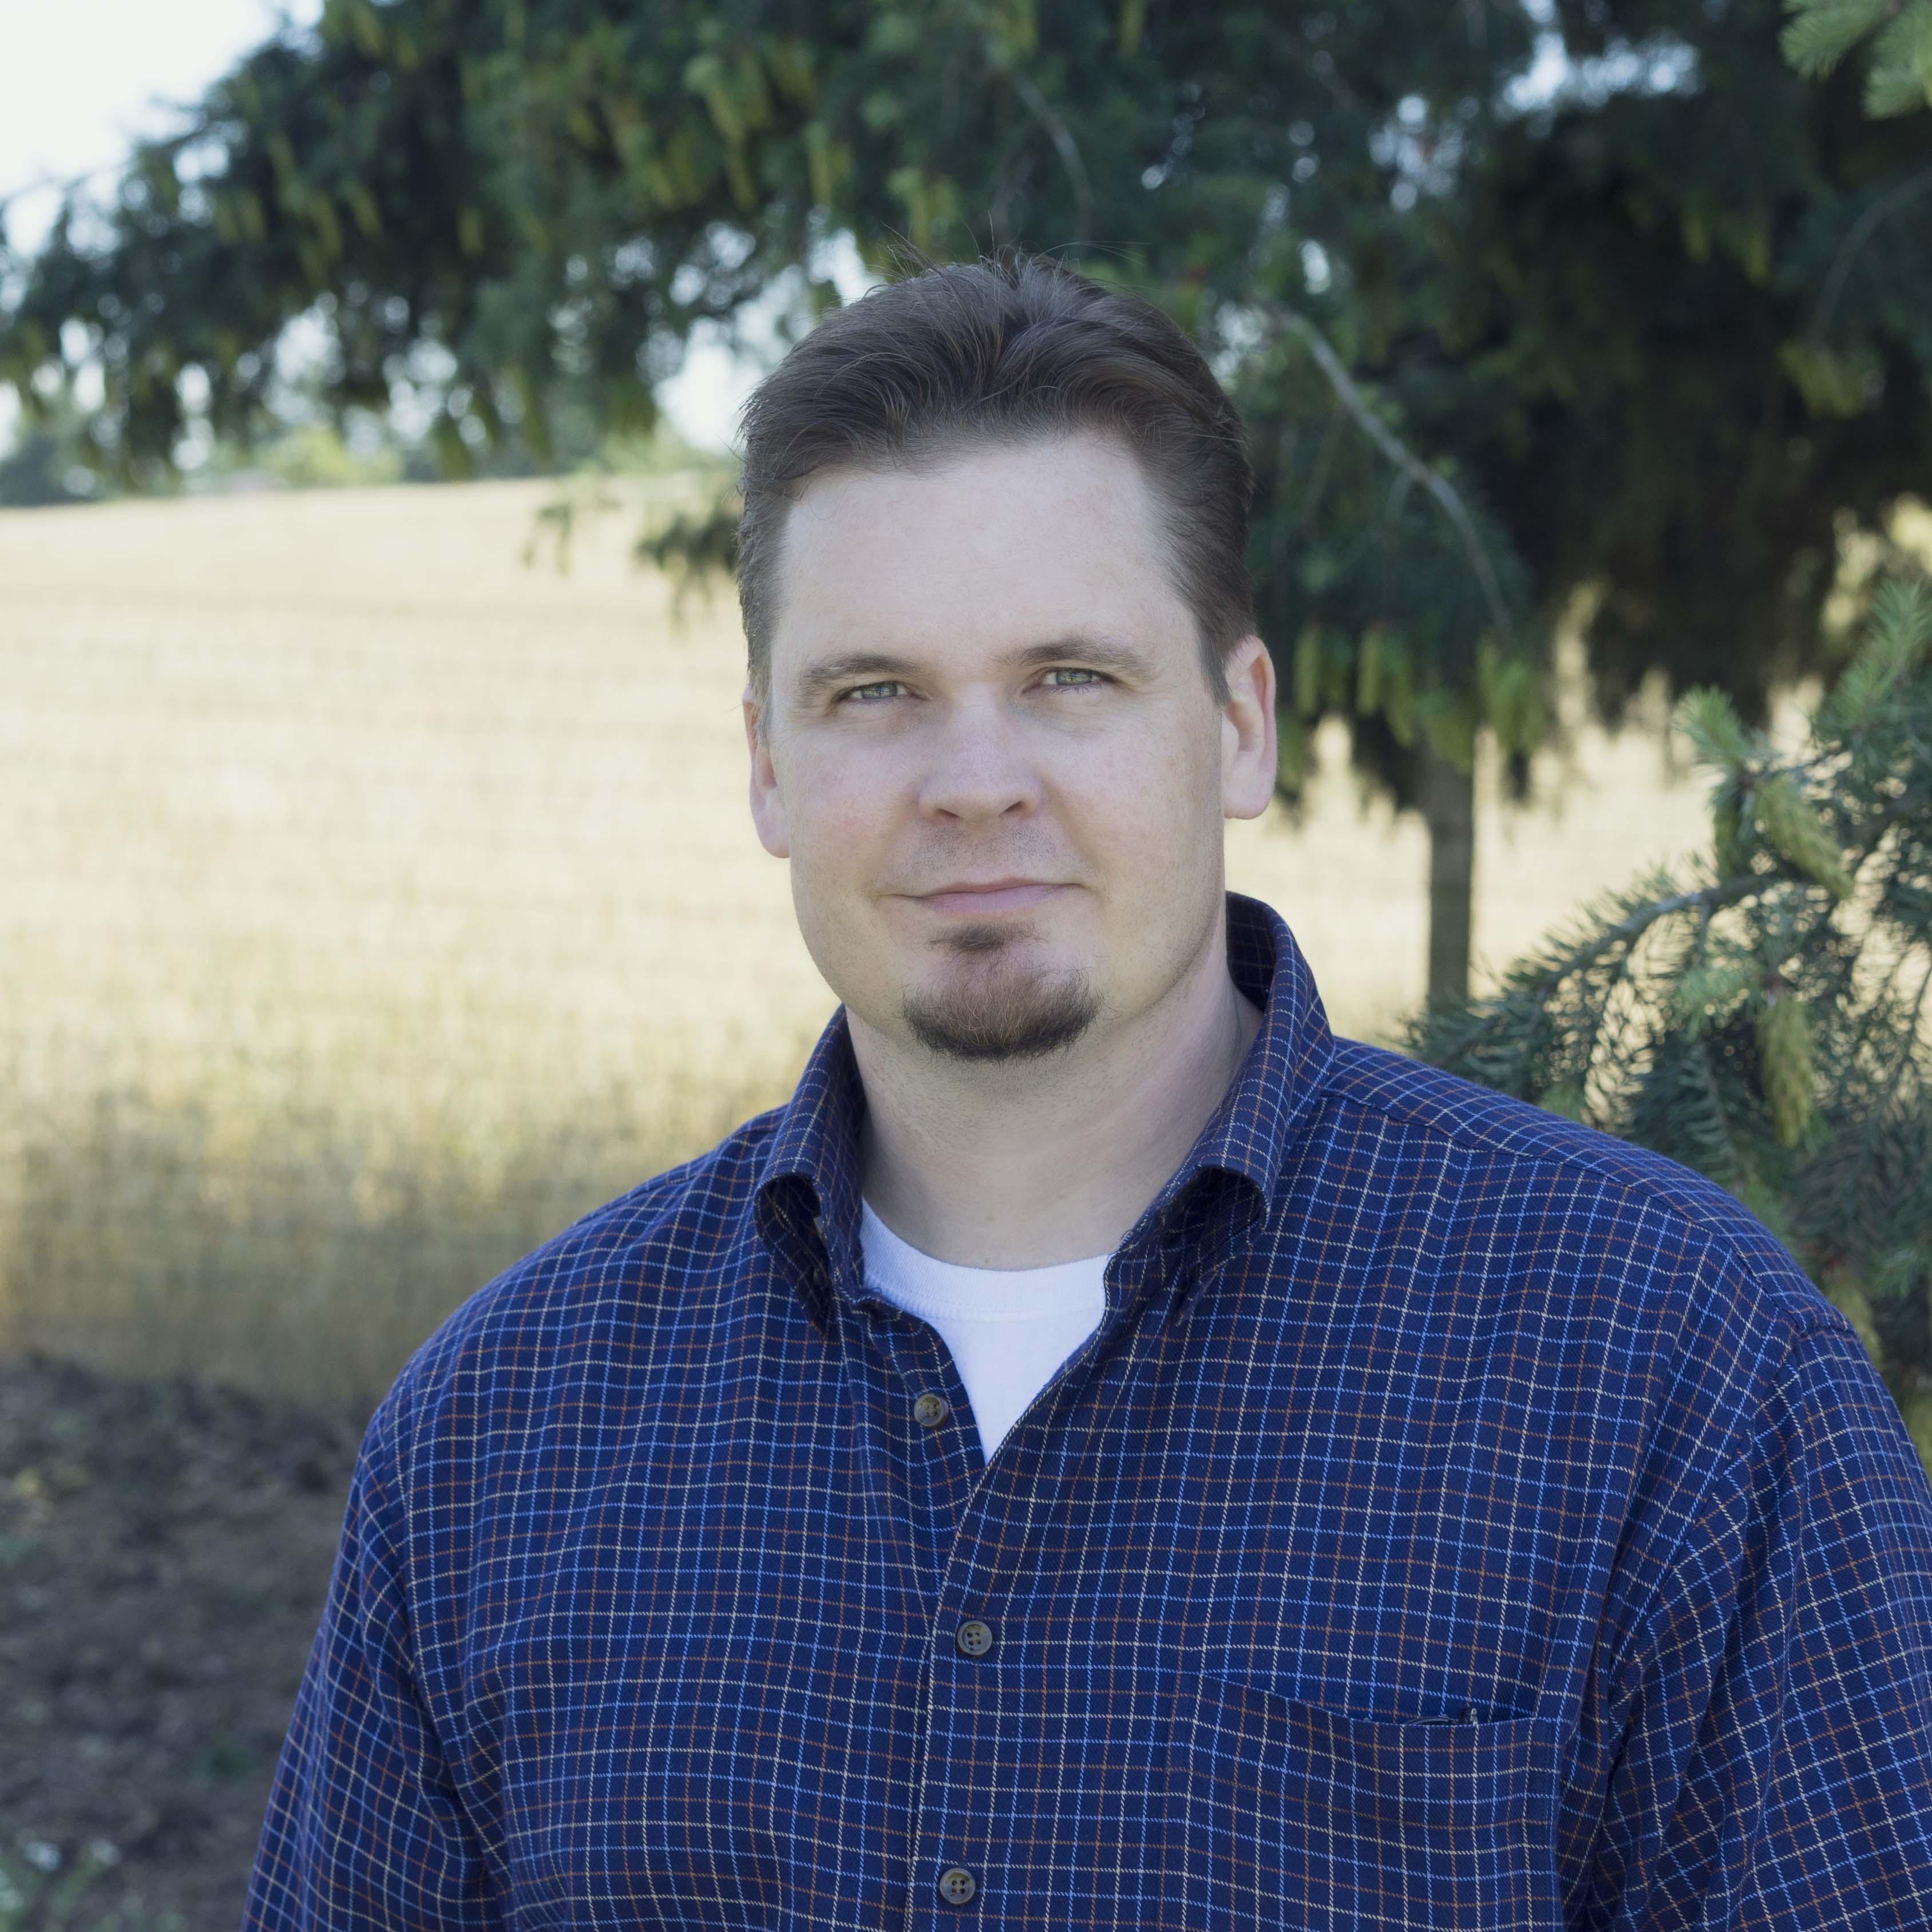 Jason Burdge